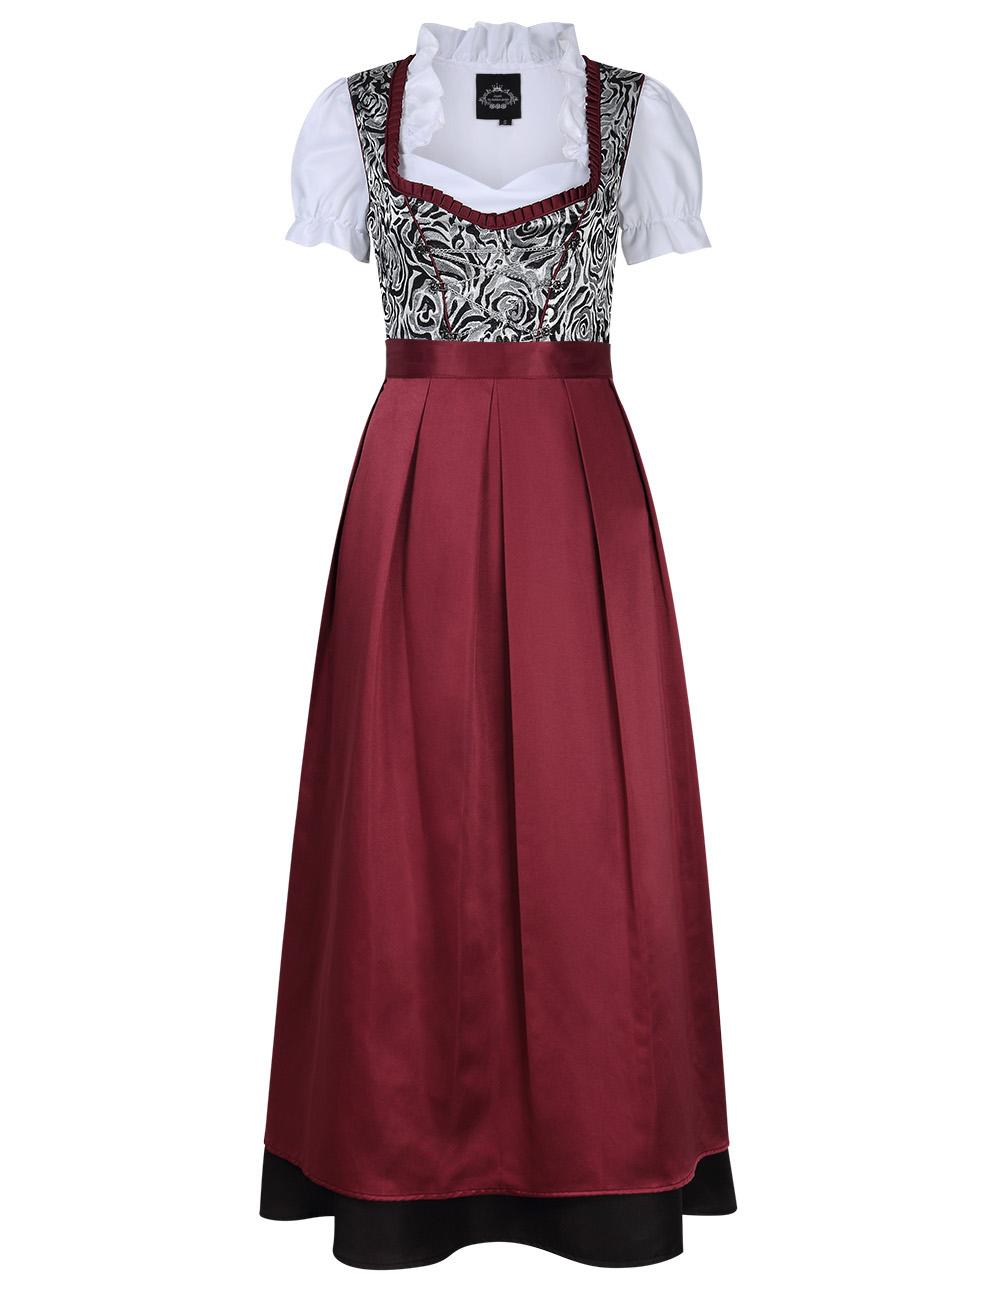 [EU Direct] Women's German Traditional Oktoberfest Costumes Classic Dress Three Pieces Suit